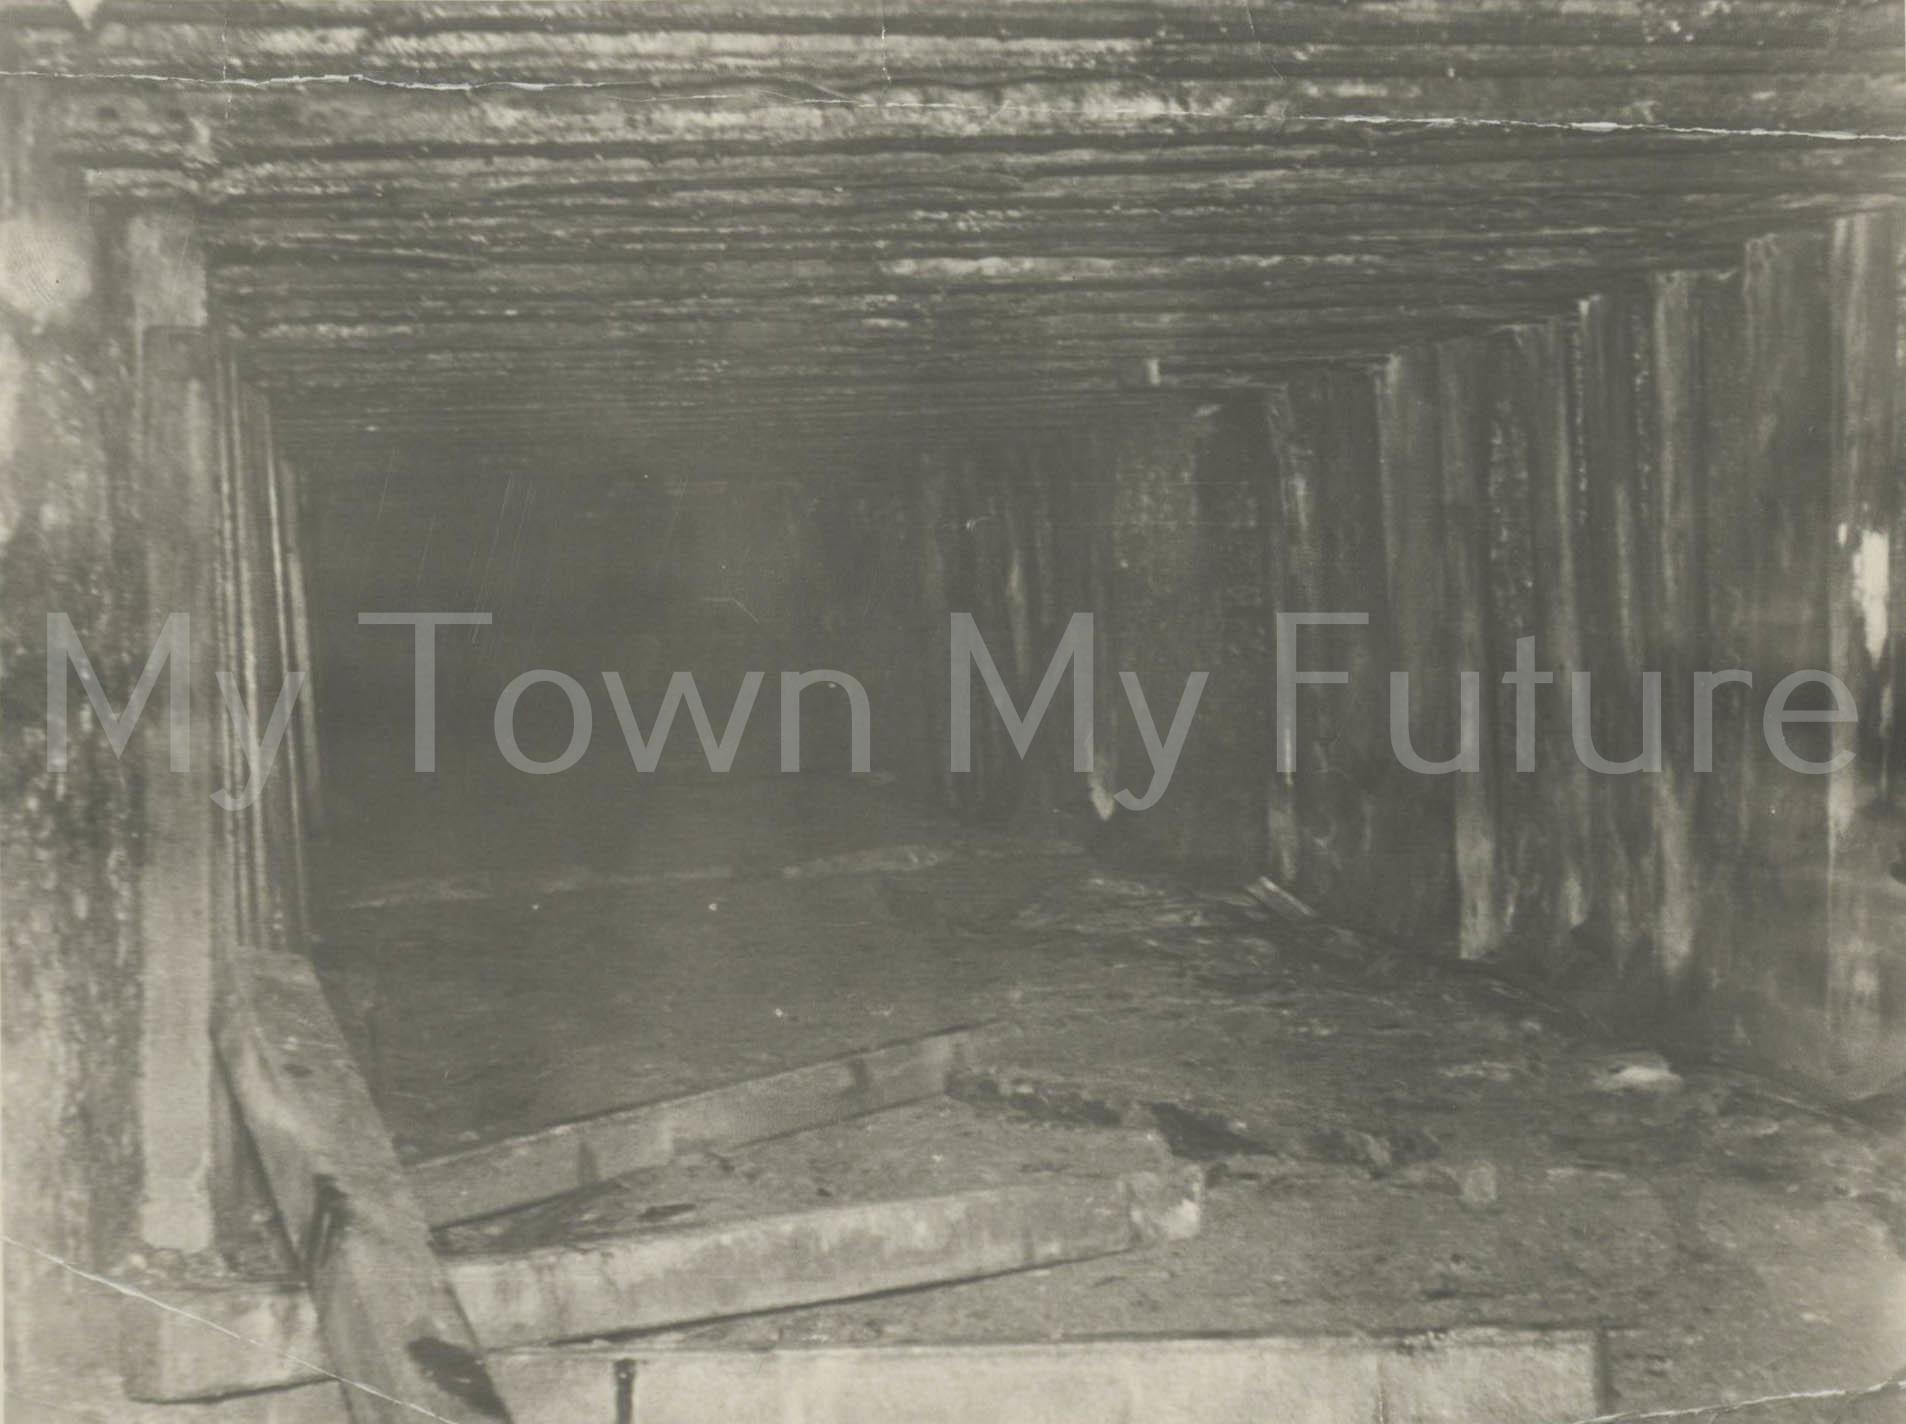 Ayton Ironstone Mine,Great Ayton